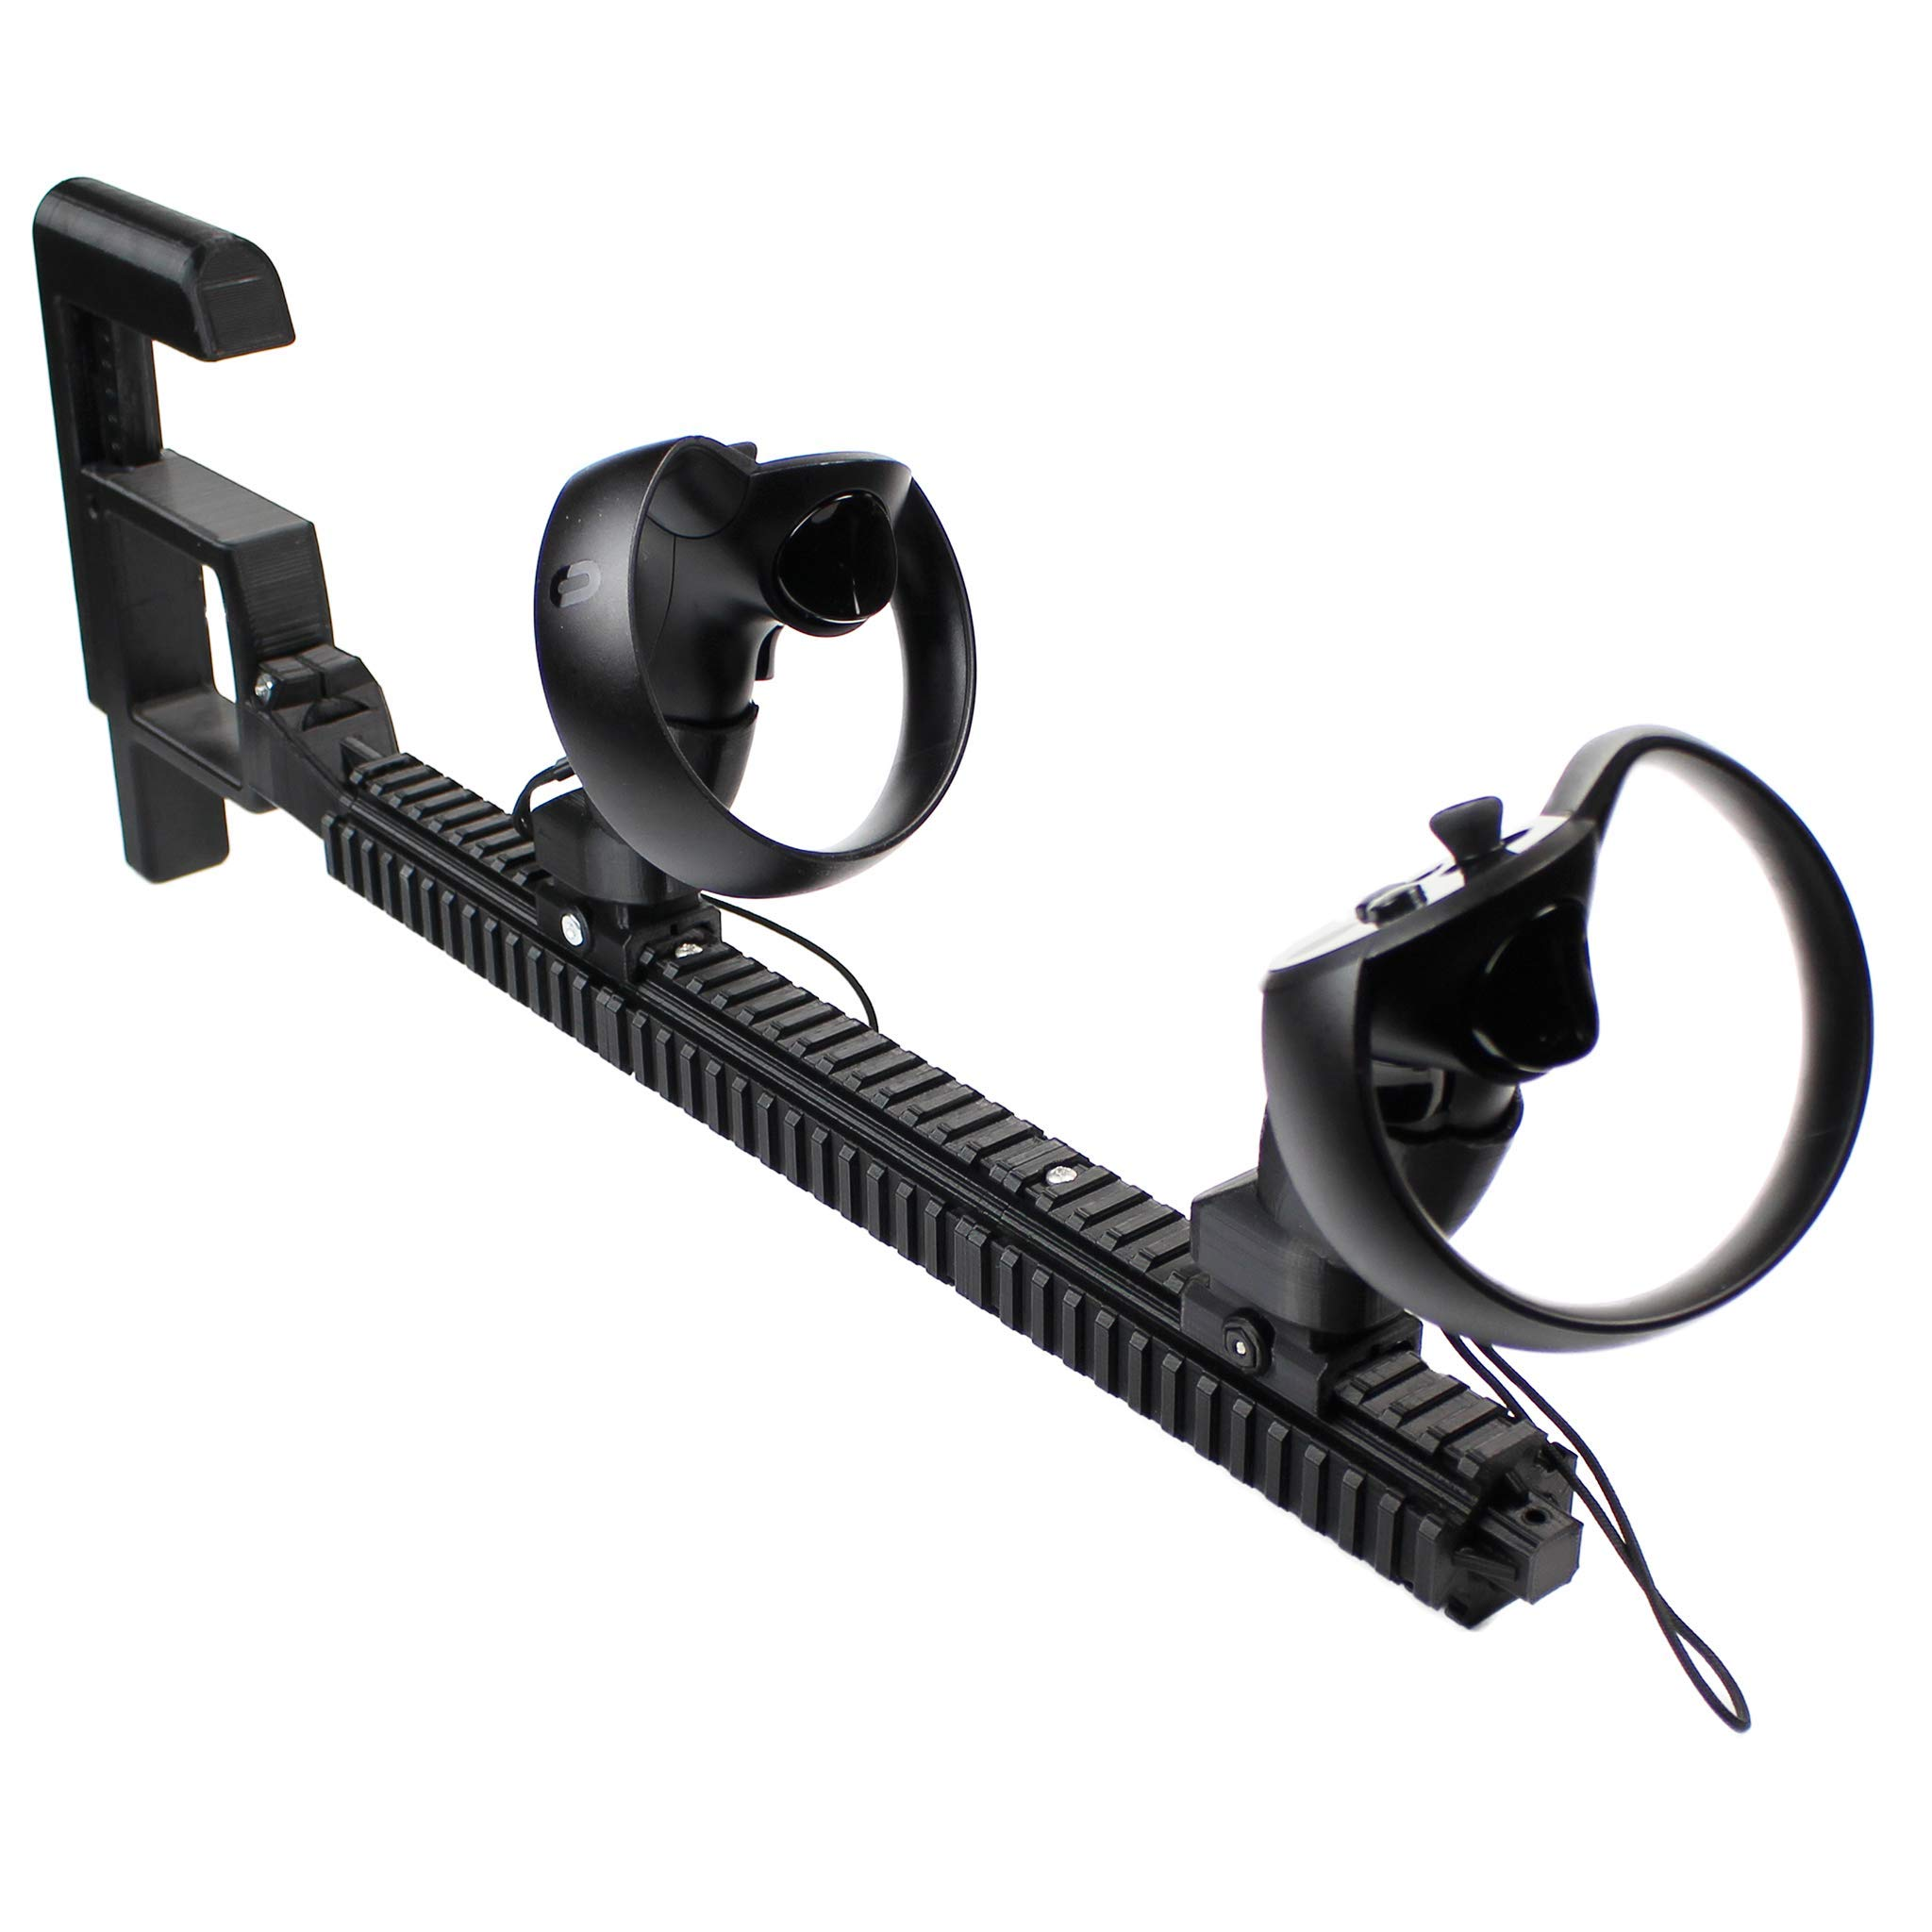 VR Controller Stock Rifle Adapter for Oculus Rift